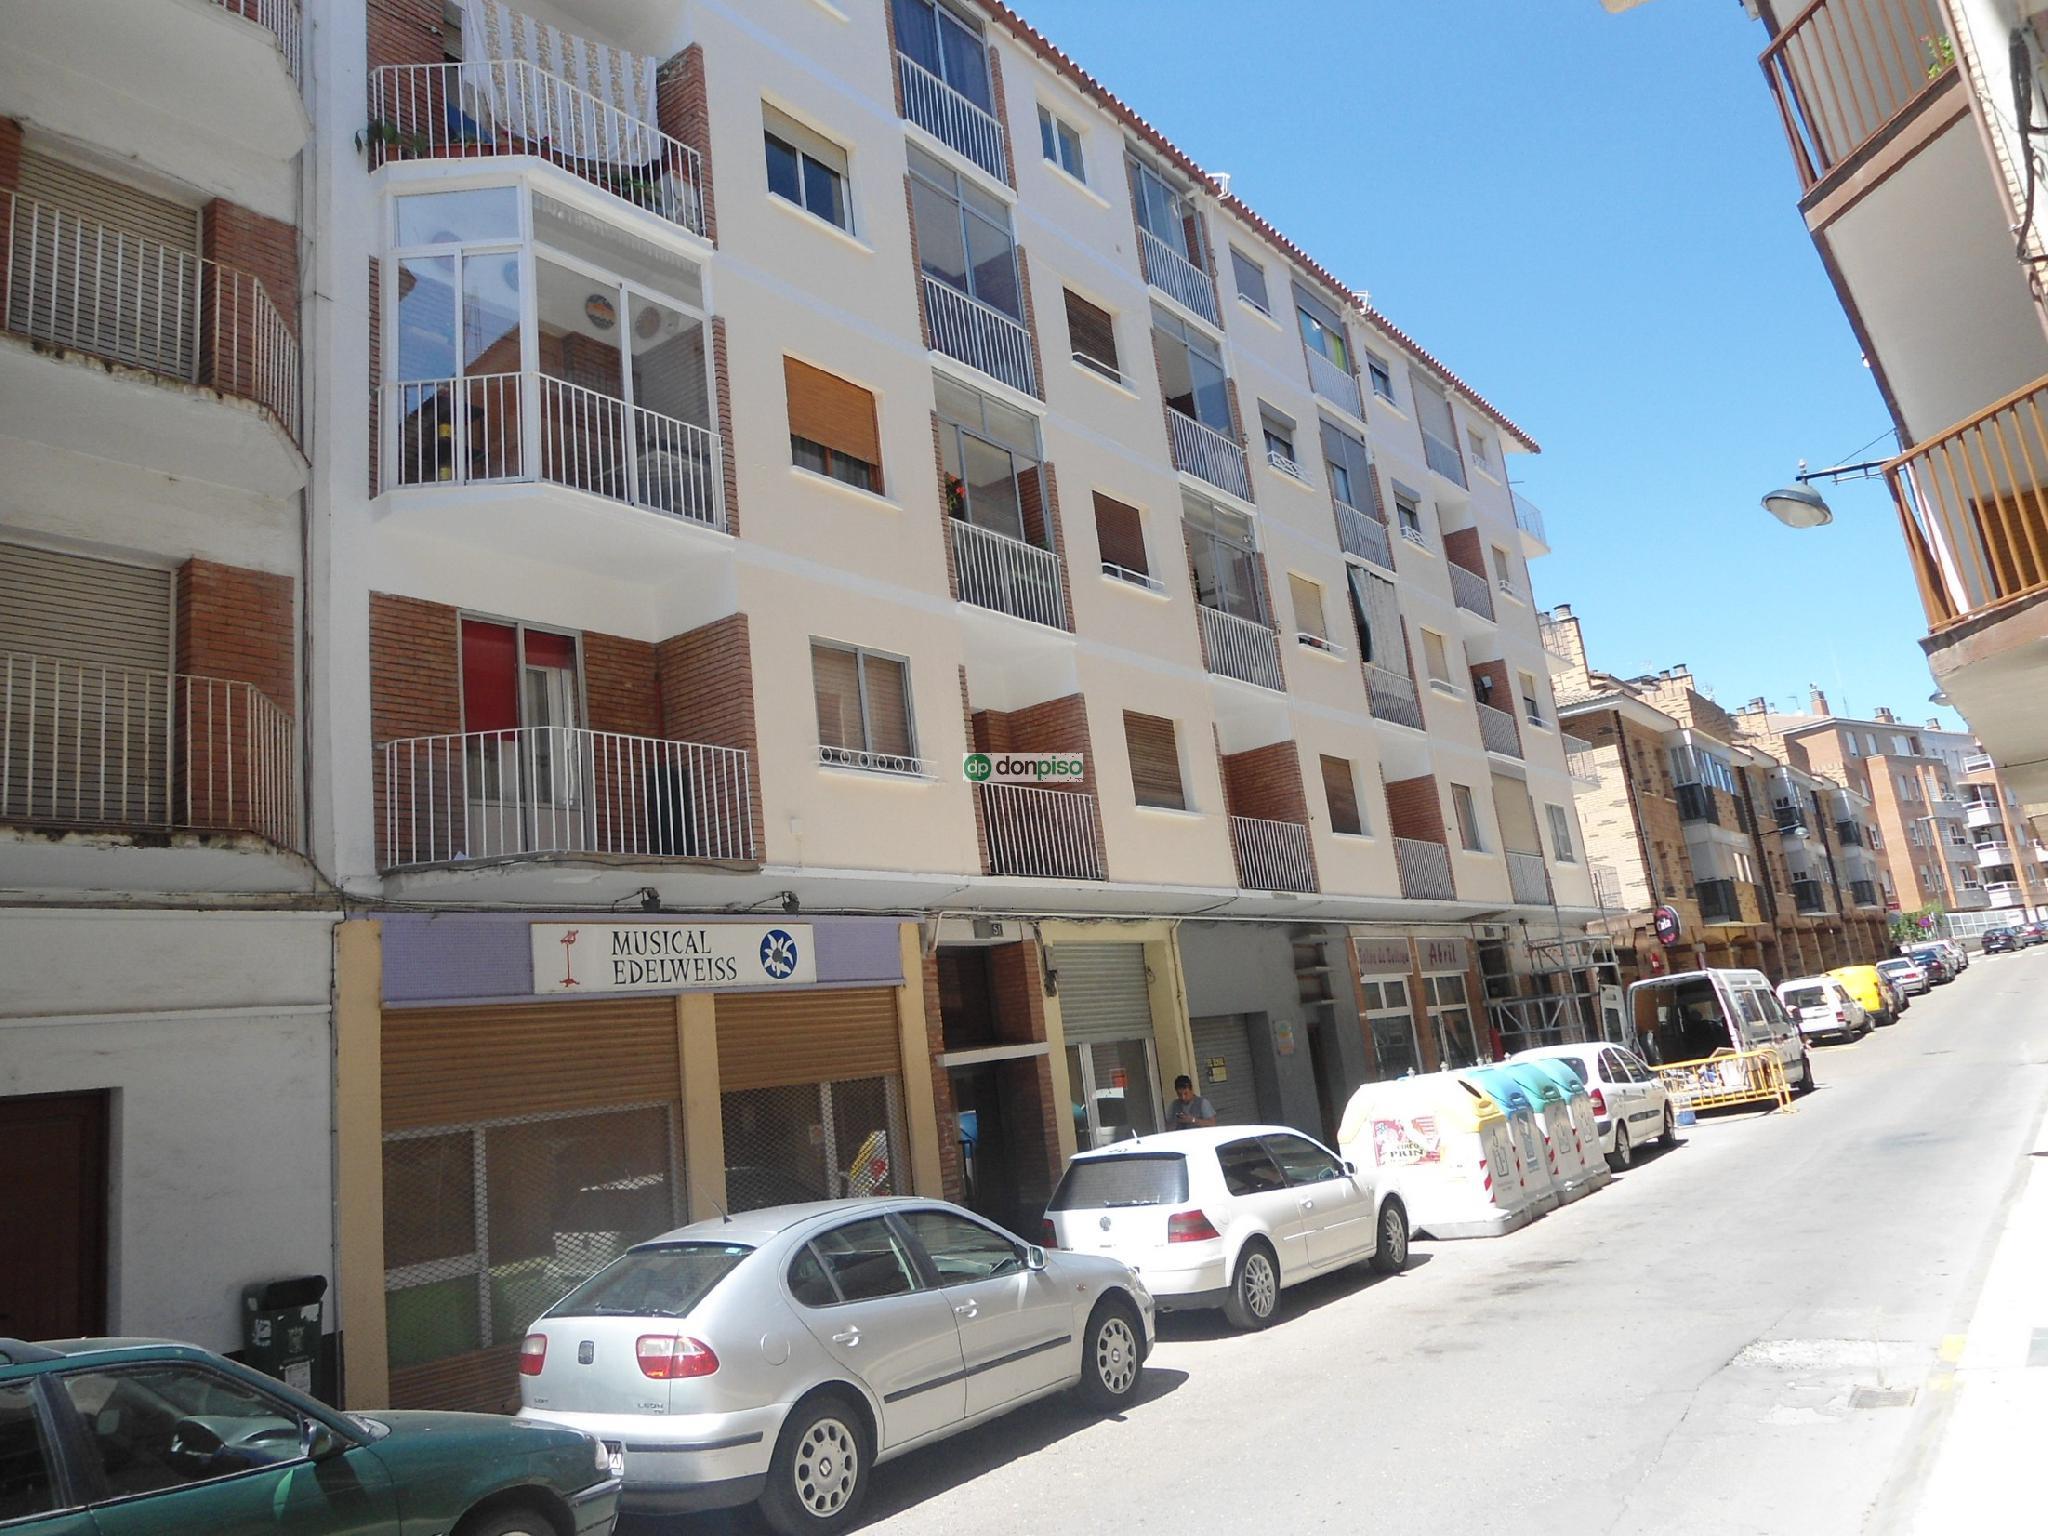 121140 - Junto a la Calle Serrablo